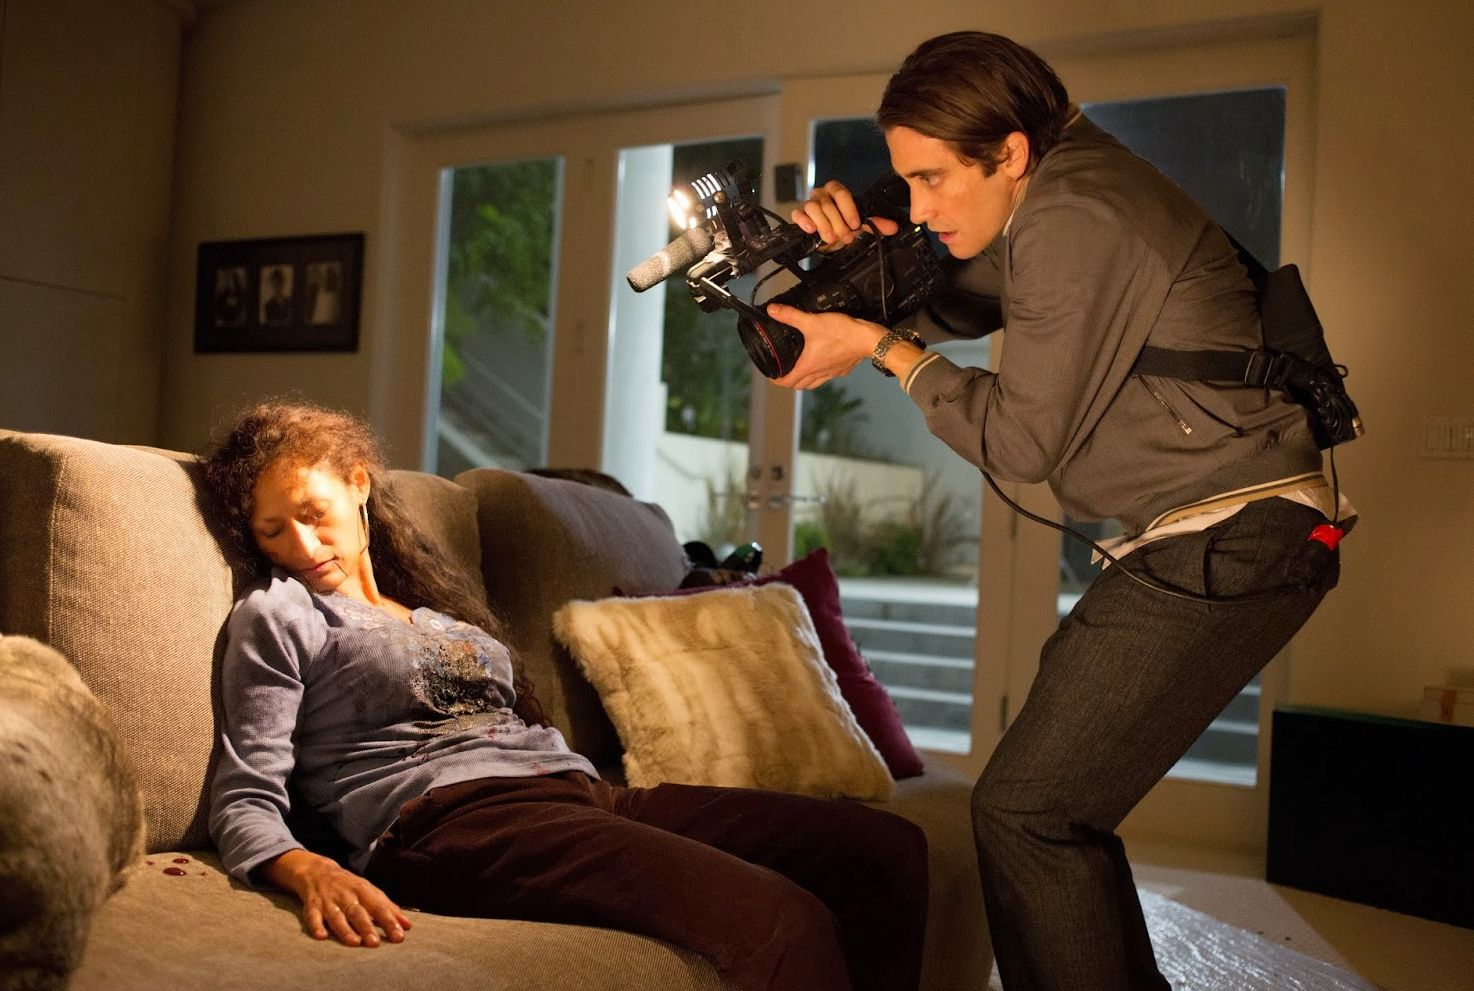 Jake Gyllenhaal films a dead woman on the couch in Nightcraw